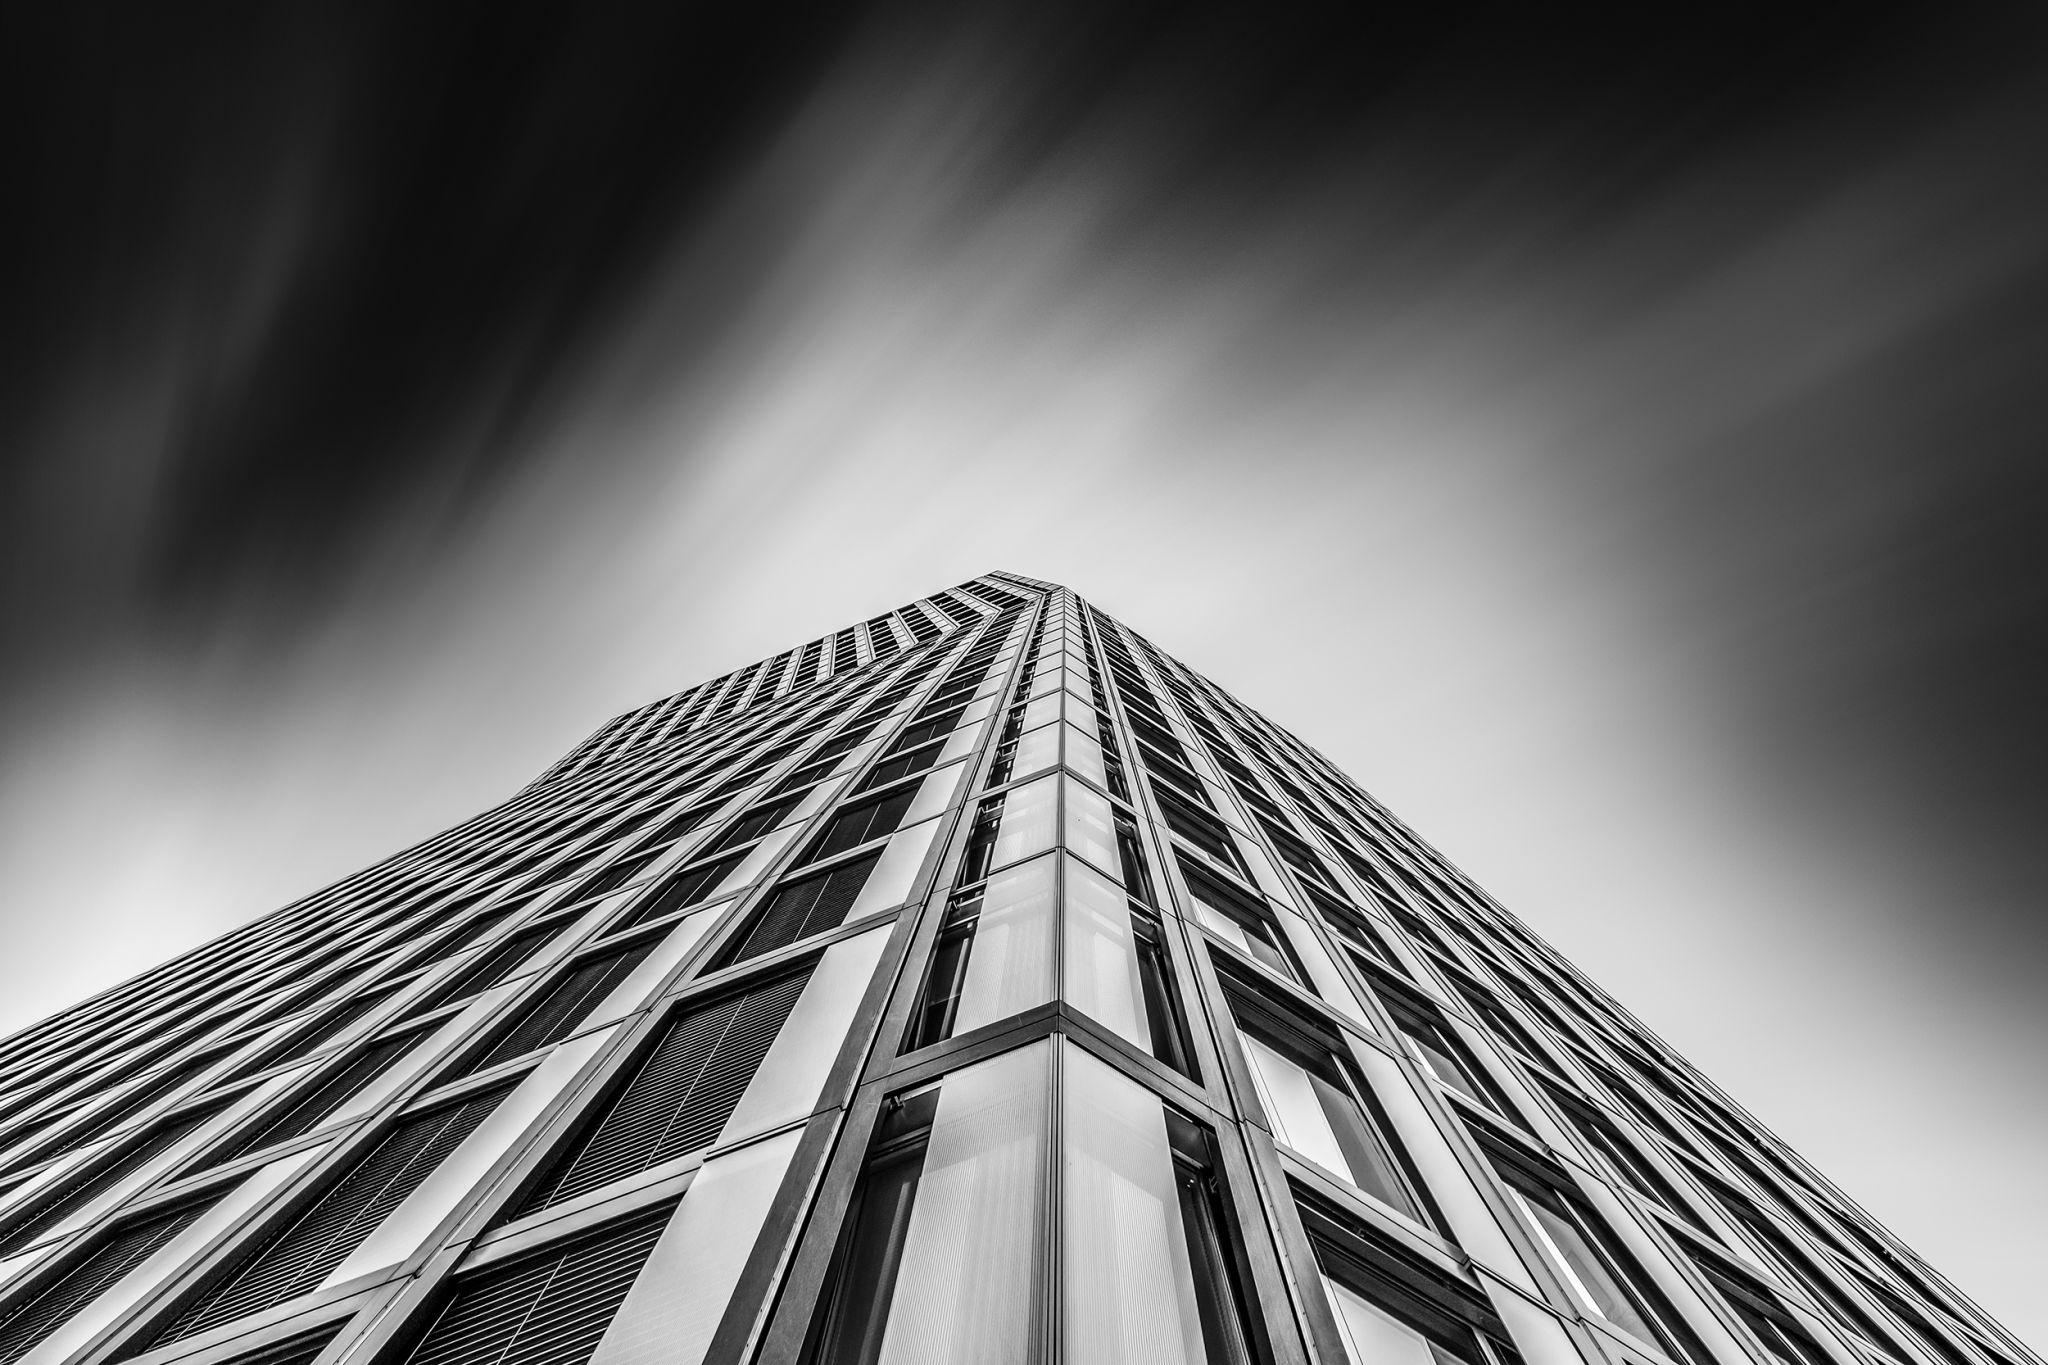 Tanzende Türme / Tango Türme (Dancing Towers), Germany